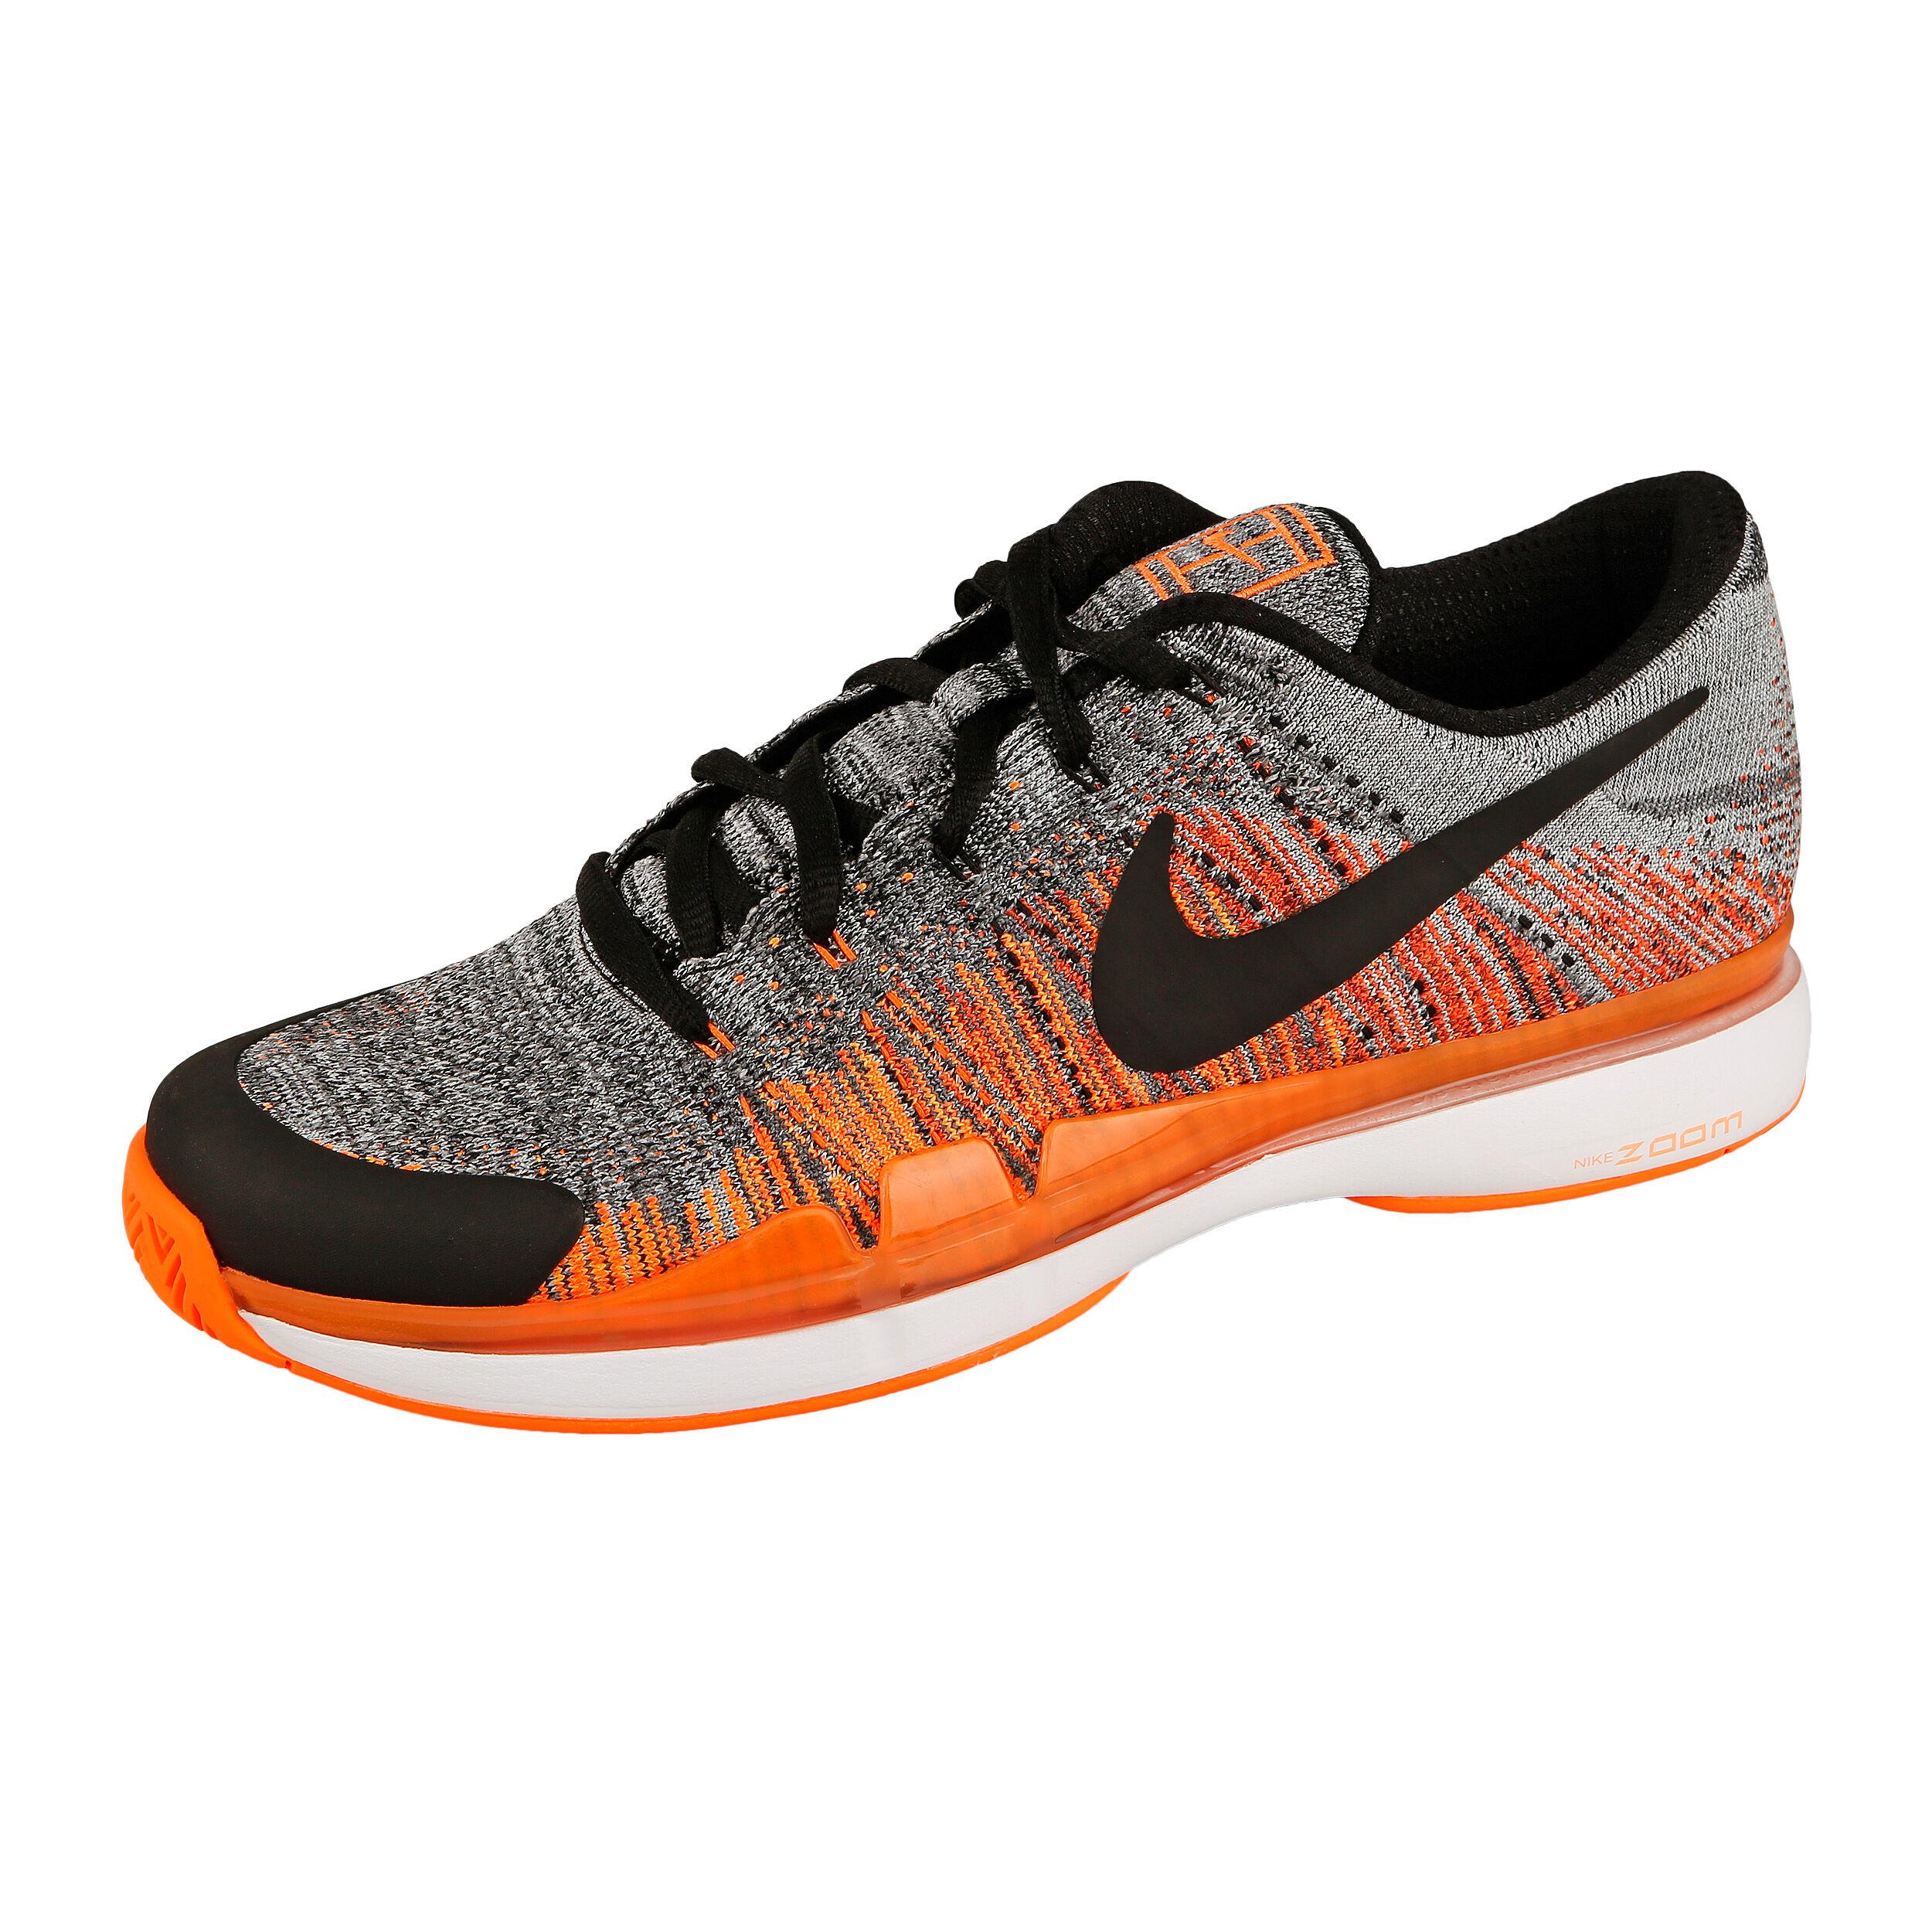 buy Nike Zoom Vapor Flyknit All Court